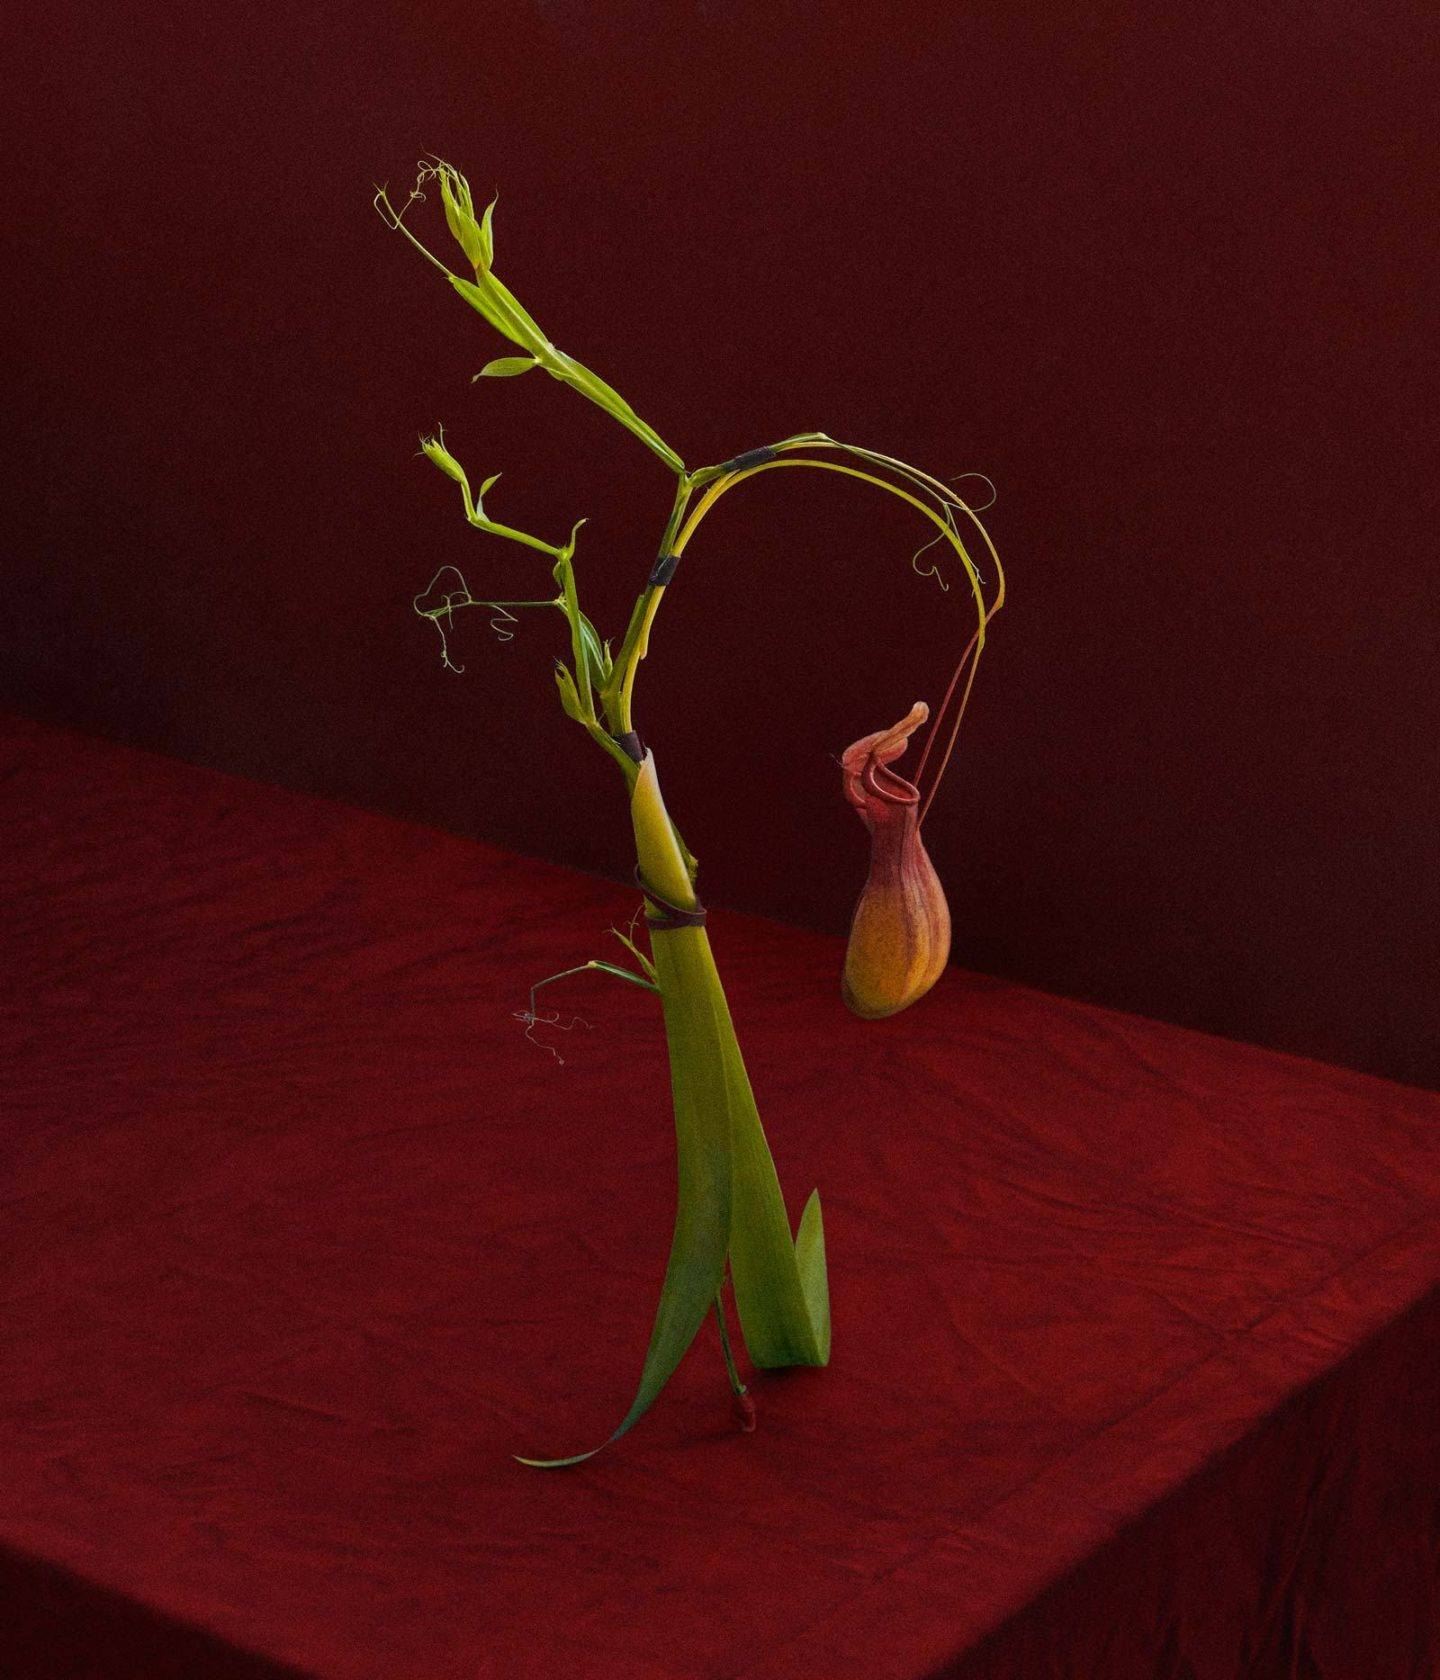 IGNANT-Art-Dominik-Tarabański-Roses-For-Mother-5